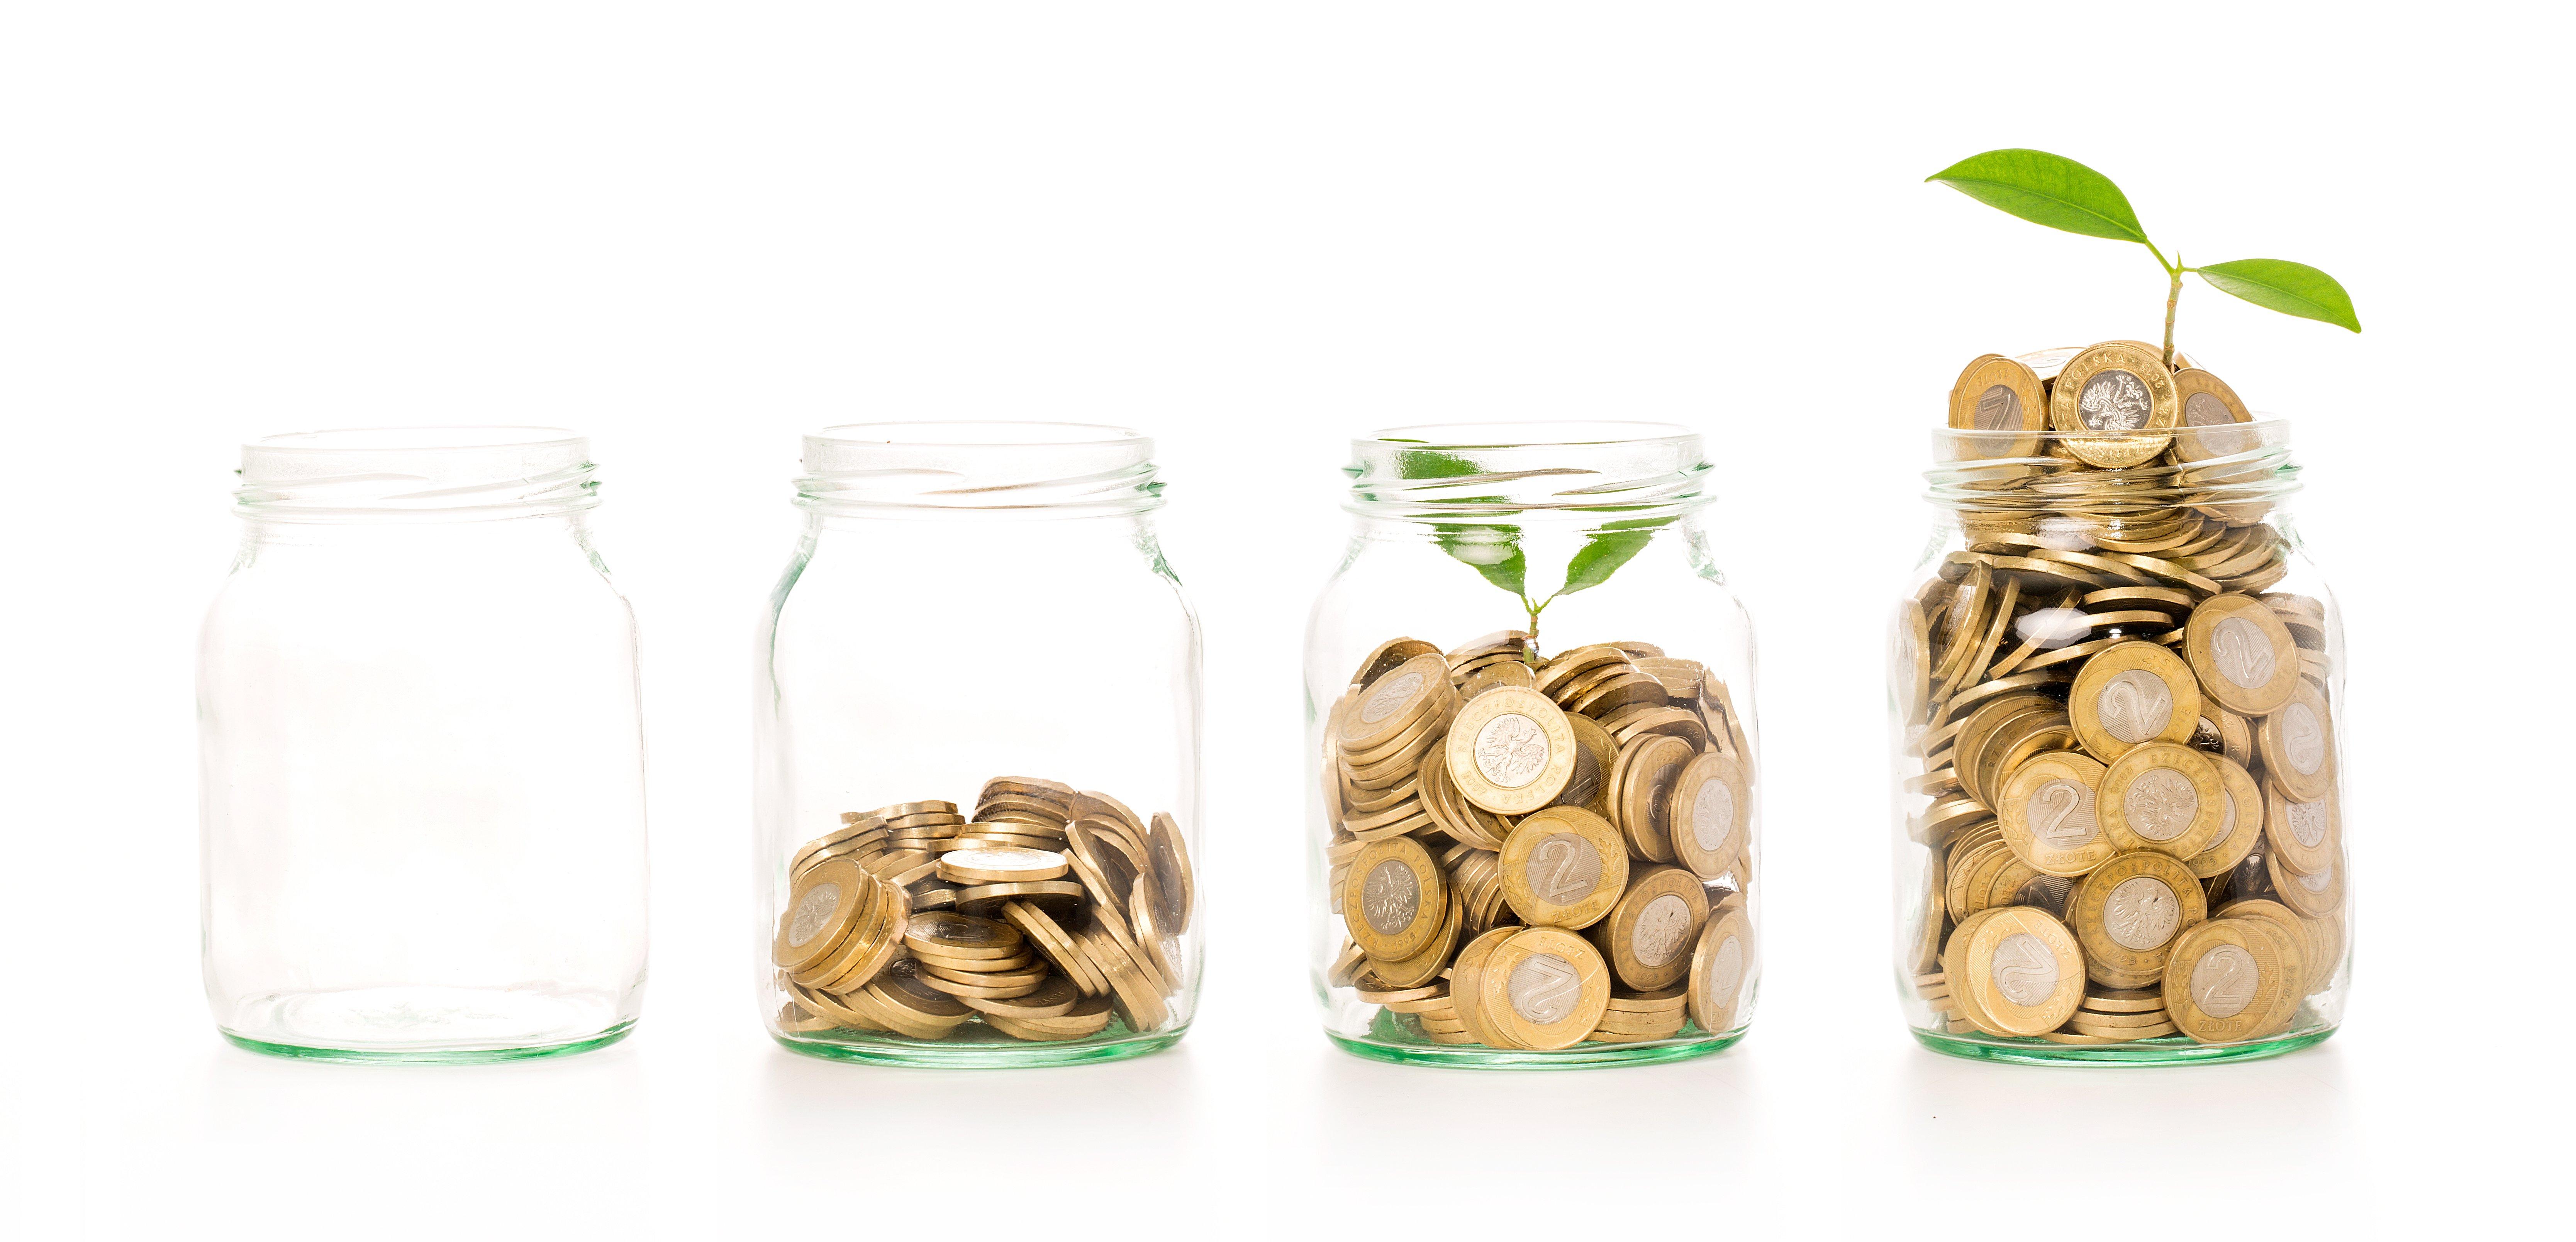 Money Growing in Jar-AdobeStock_104059872